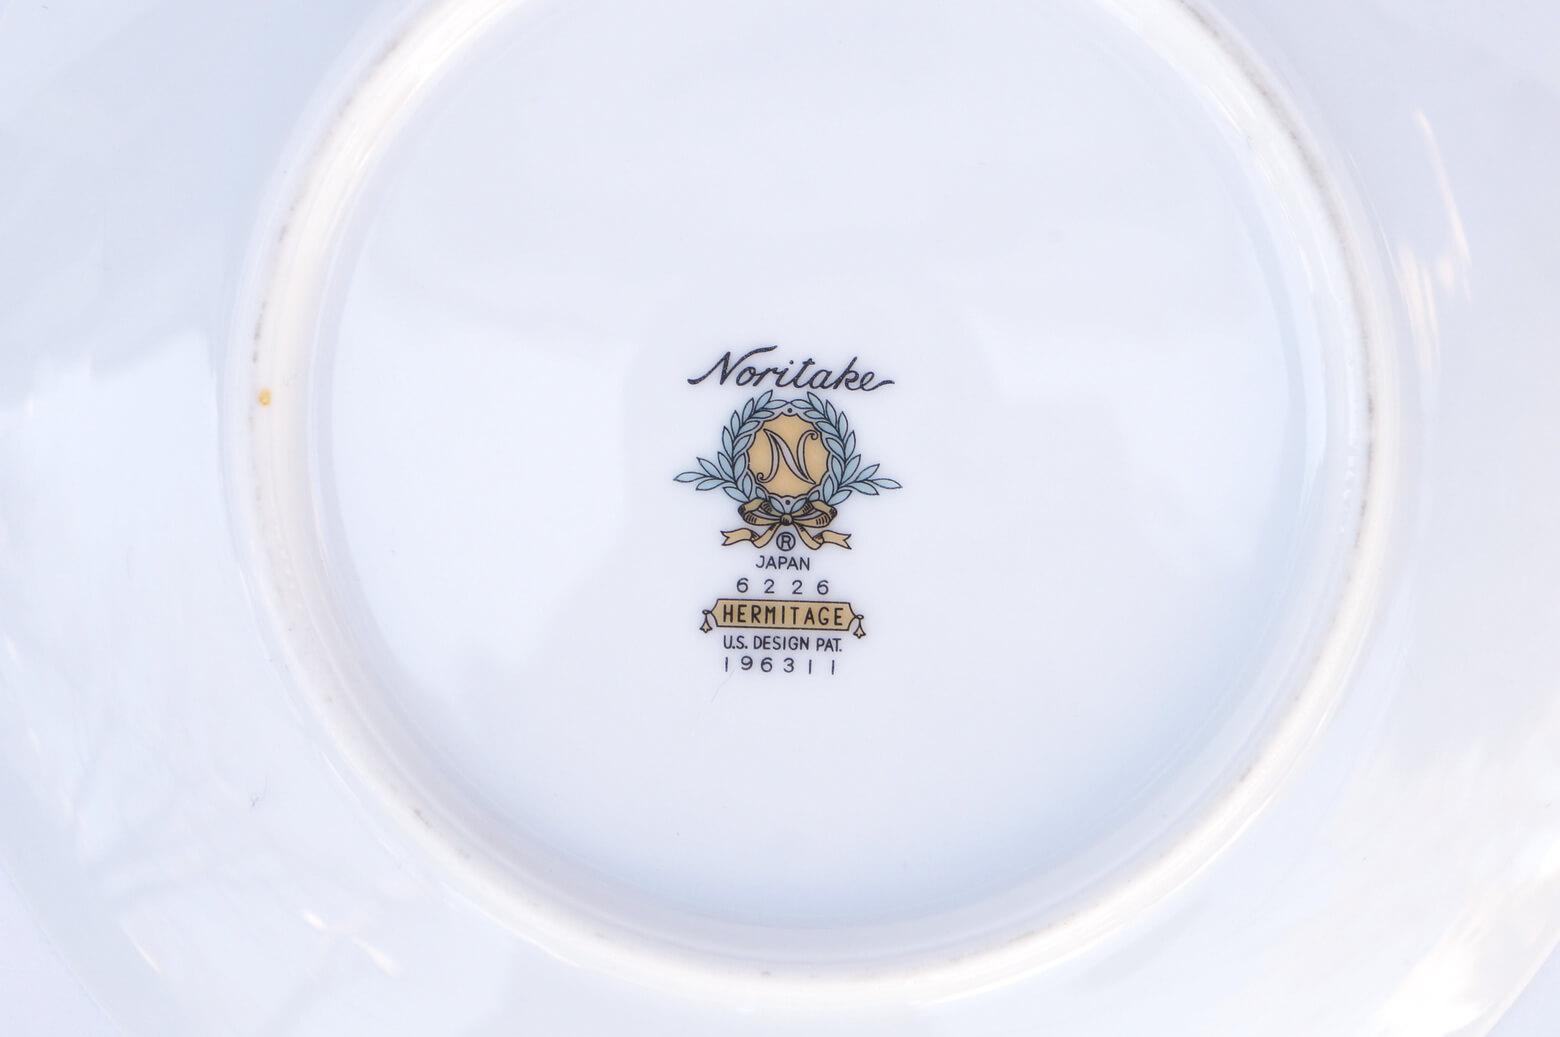 Vintage Noritake Cake Plate Hermitage U.S. Pattern Tableware/ノリタケ ケーキ プレート エルミタージュ テーブルウェア レトロ ヴィンテージ食器 1